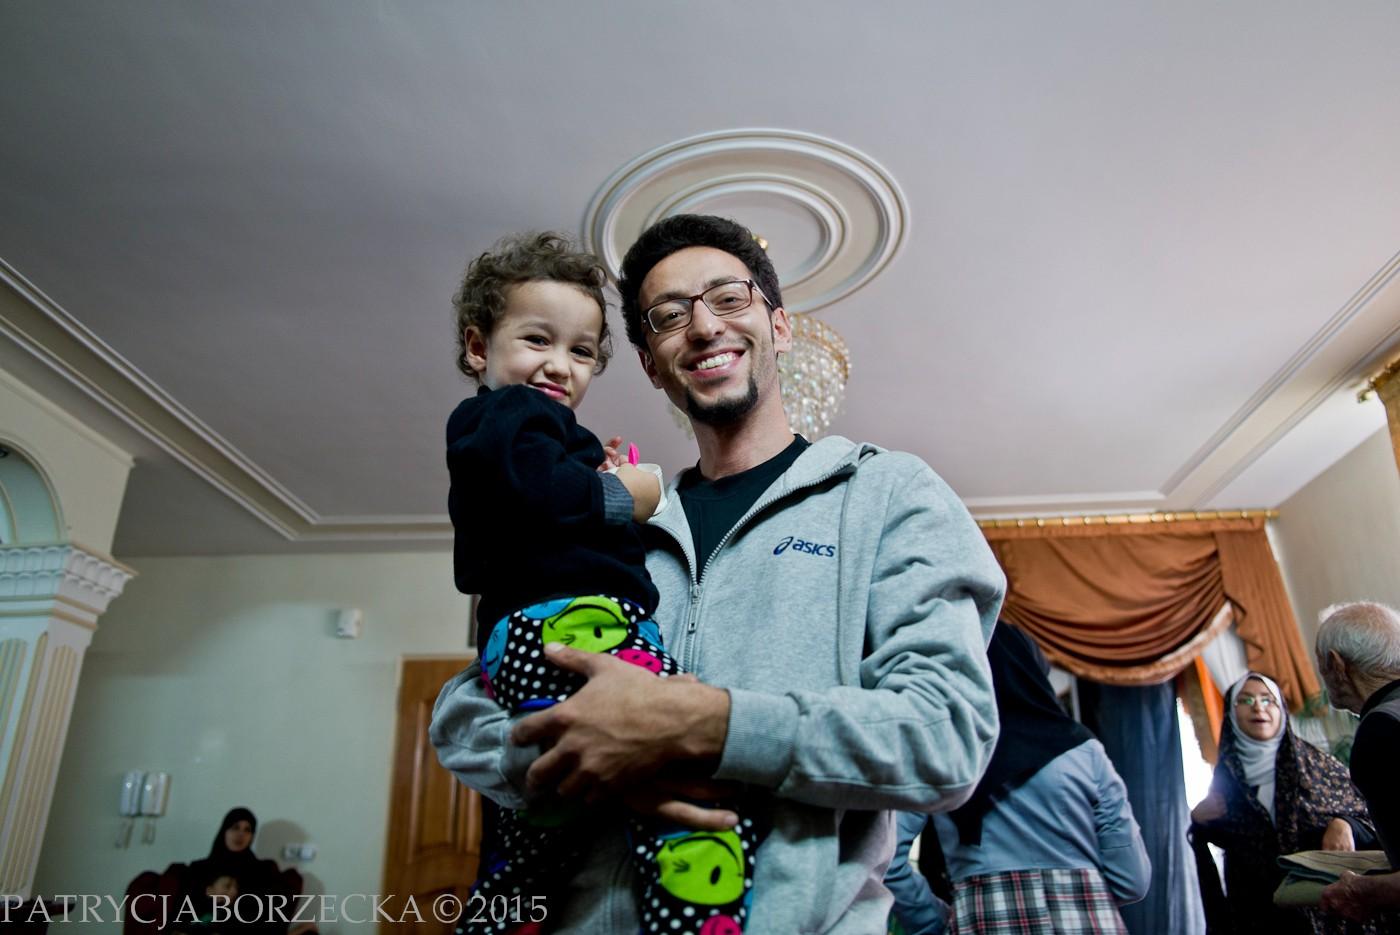 PatrycjaBorzecka-photography-Iran-people02